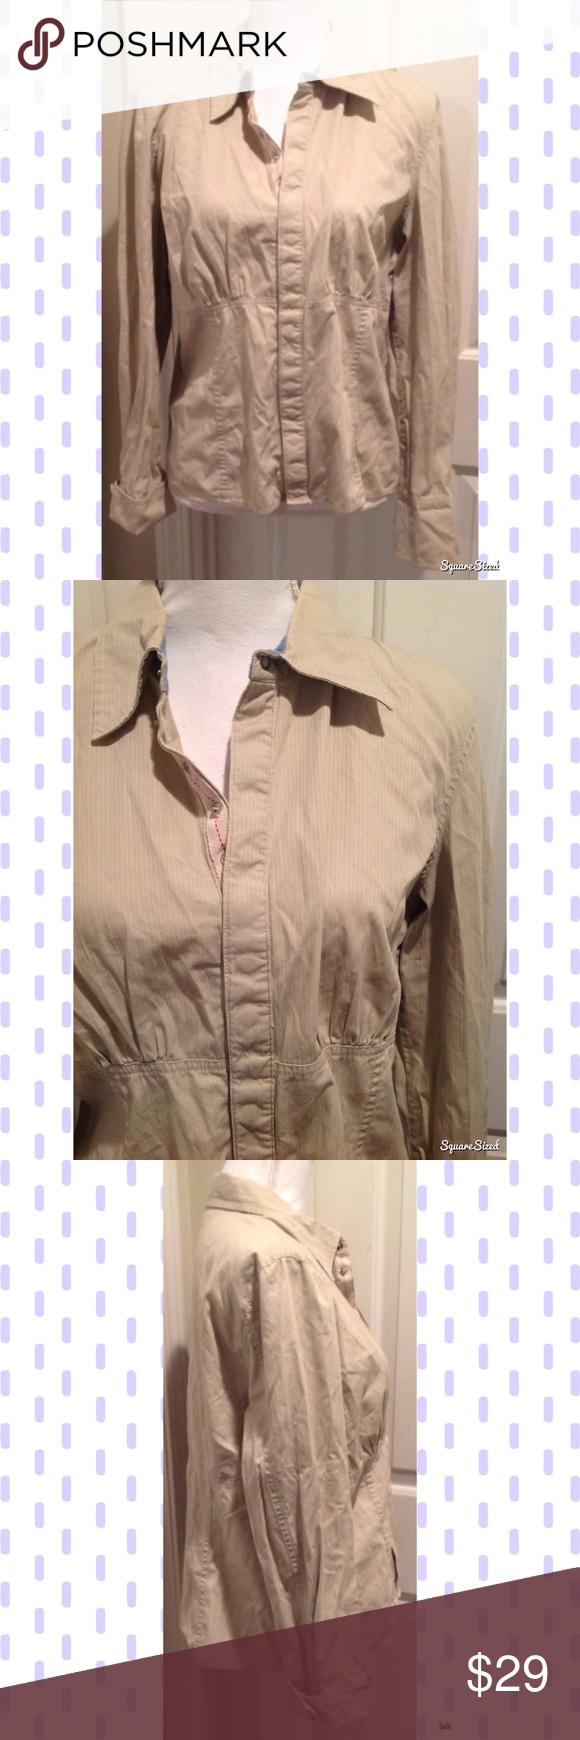 🌻 Tommy Hilfiger Long Sleeve Shirt Size: XL. 100% Cotton. Tommy Hilfiger Tops Tees - Long Sleeve